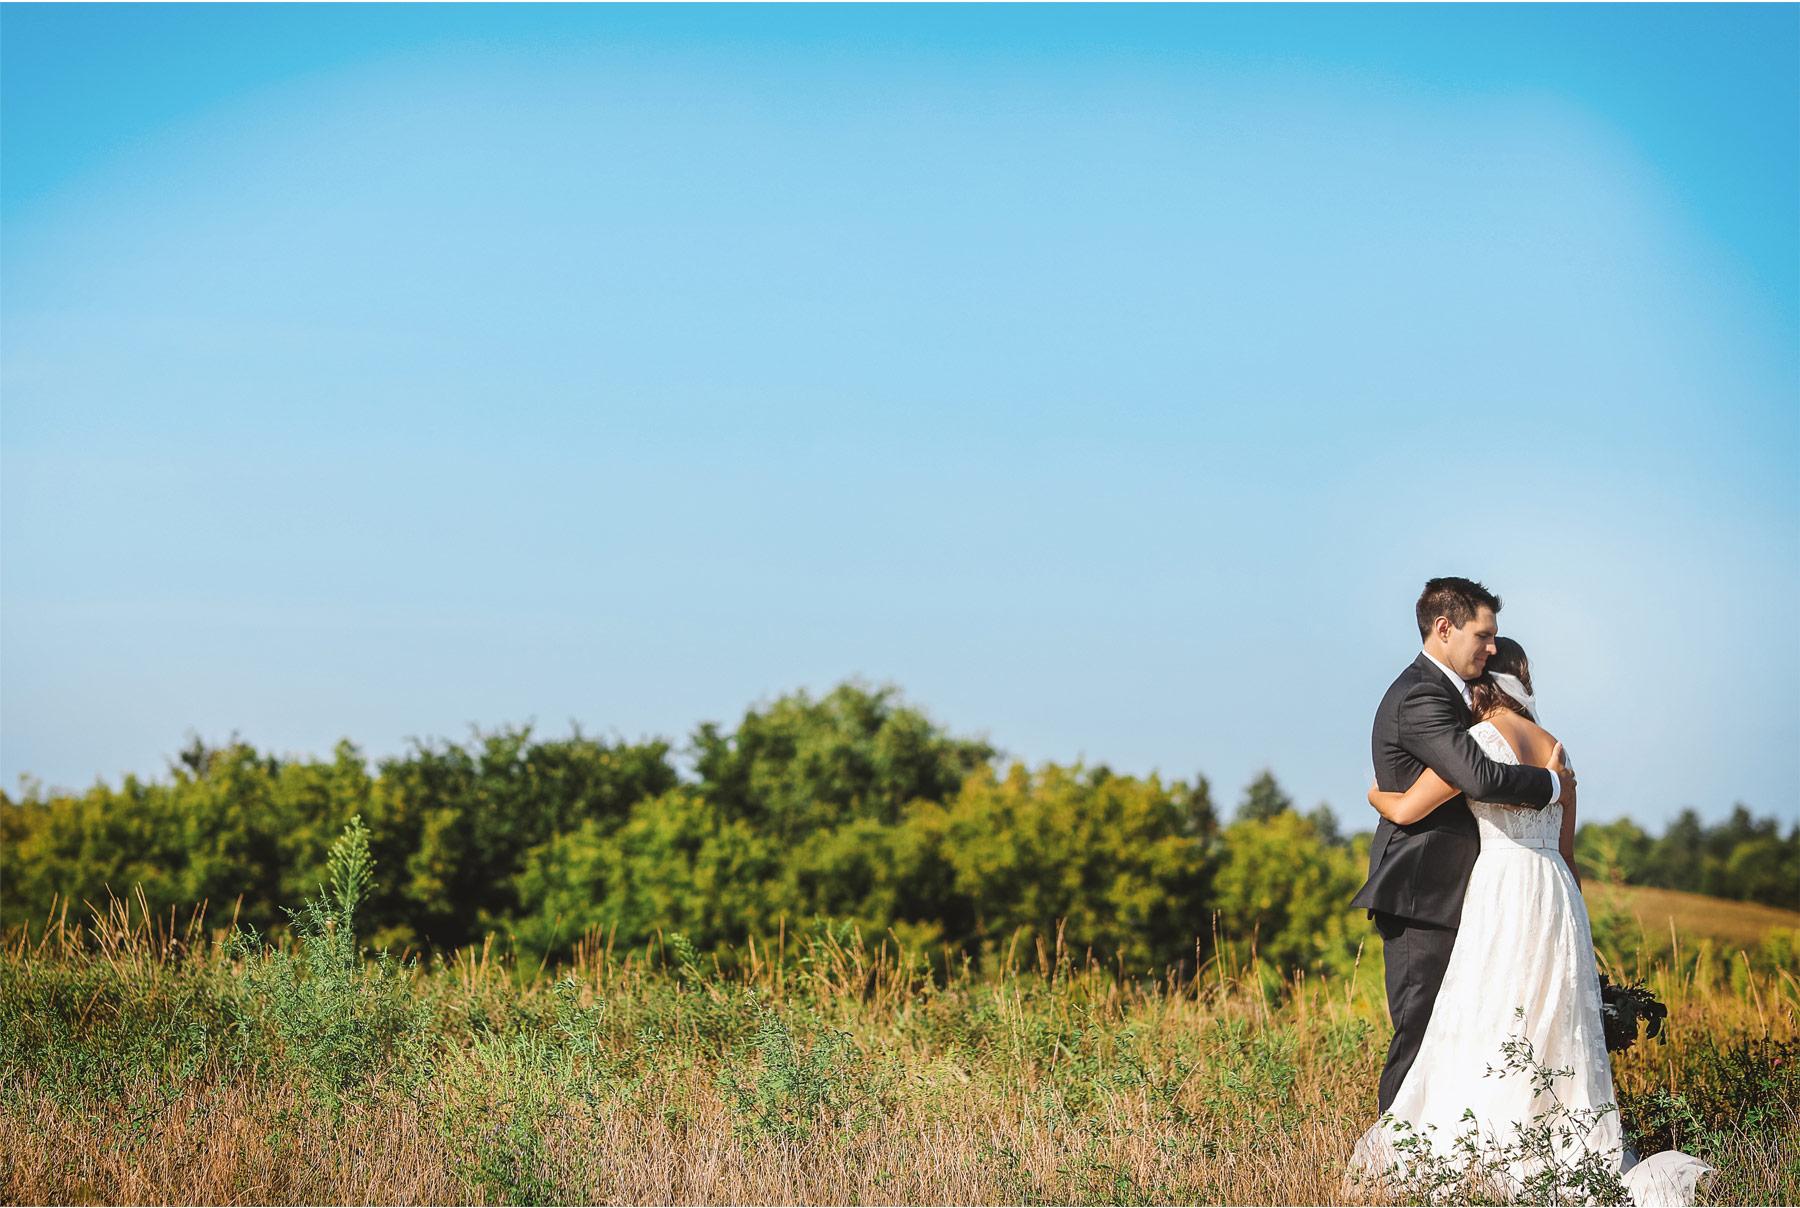 15-Weding-by-Vick-Photography-Minneapolis-Minnesota-Bavaria-Downs-Outdoor-Summer-Bride-Groom-Rebecca-and-Mark.jpg